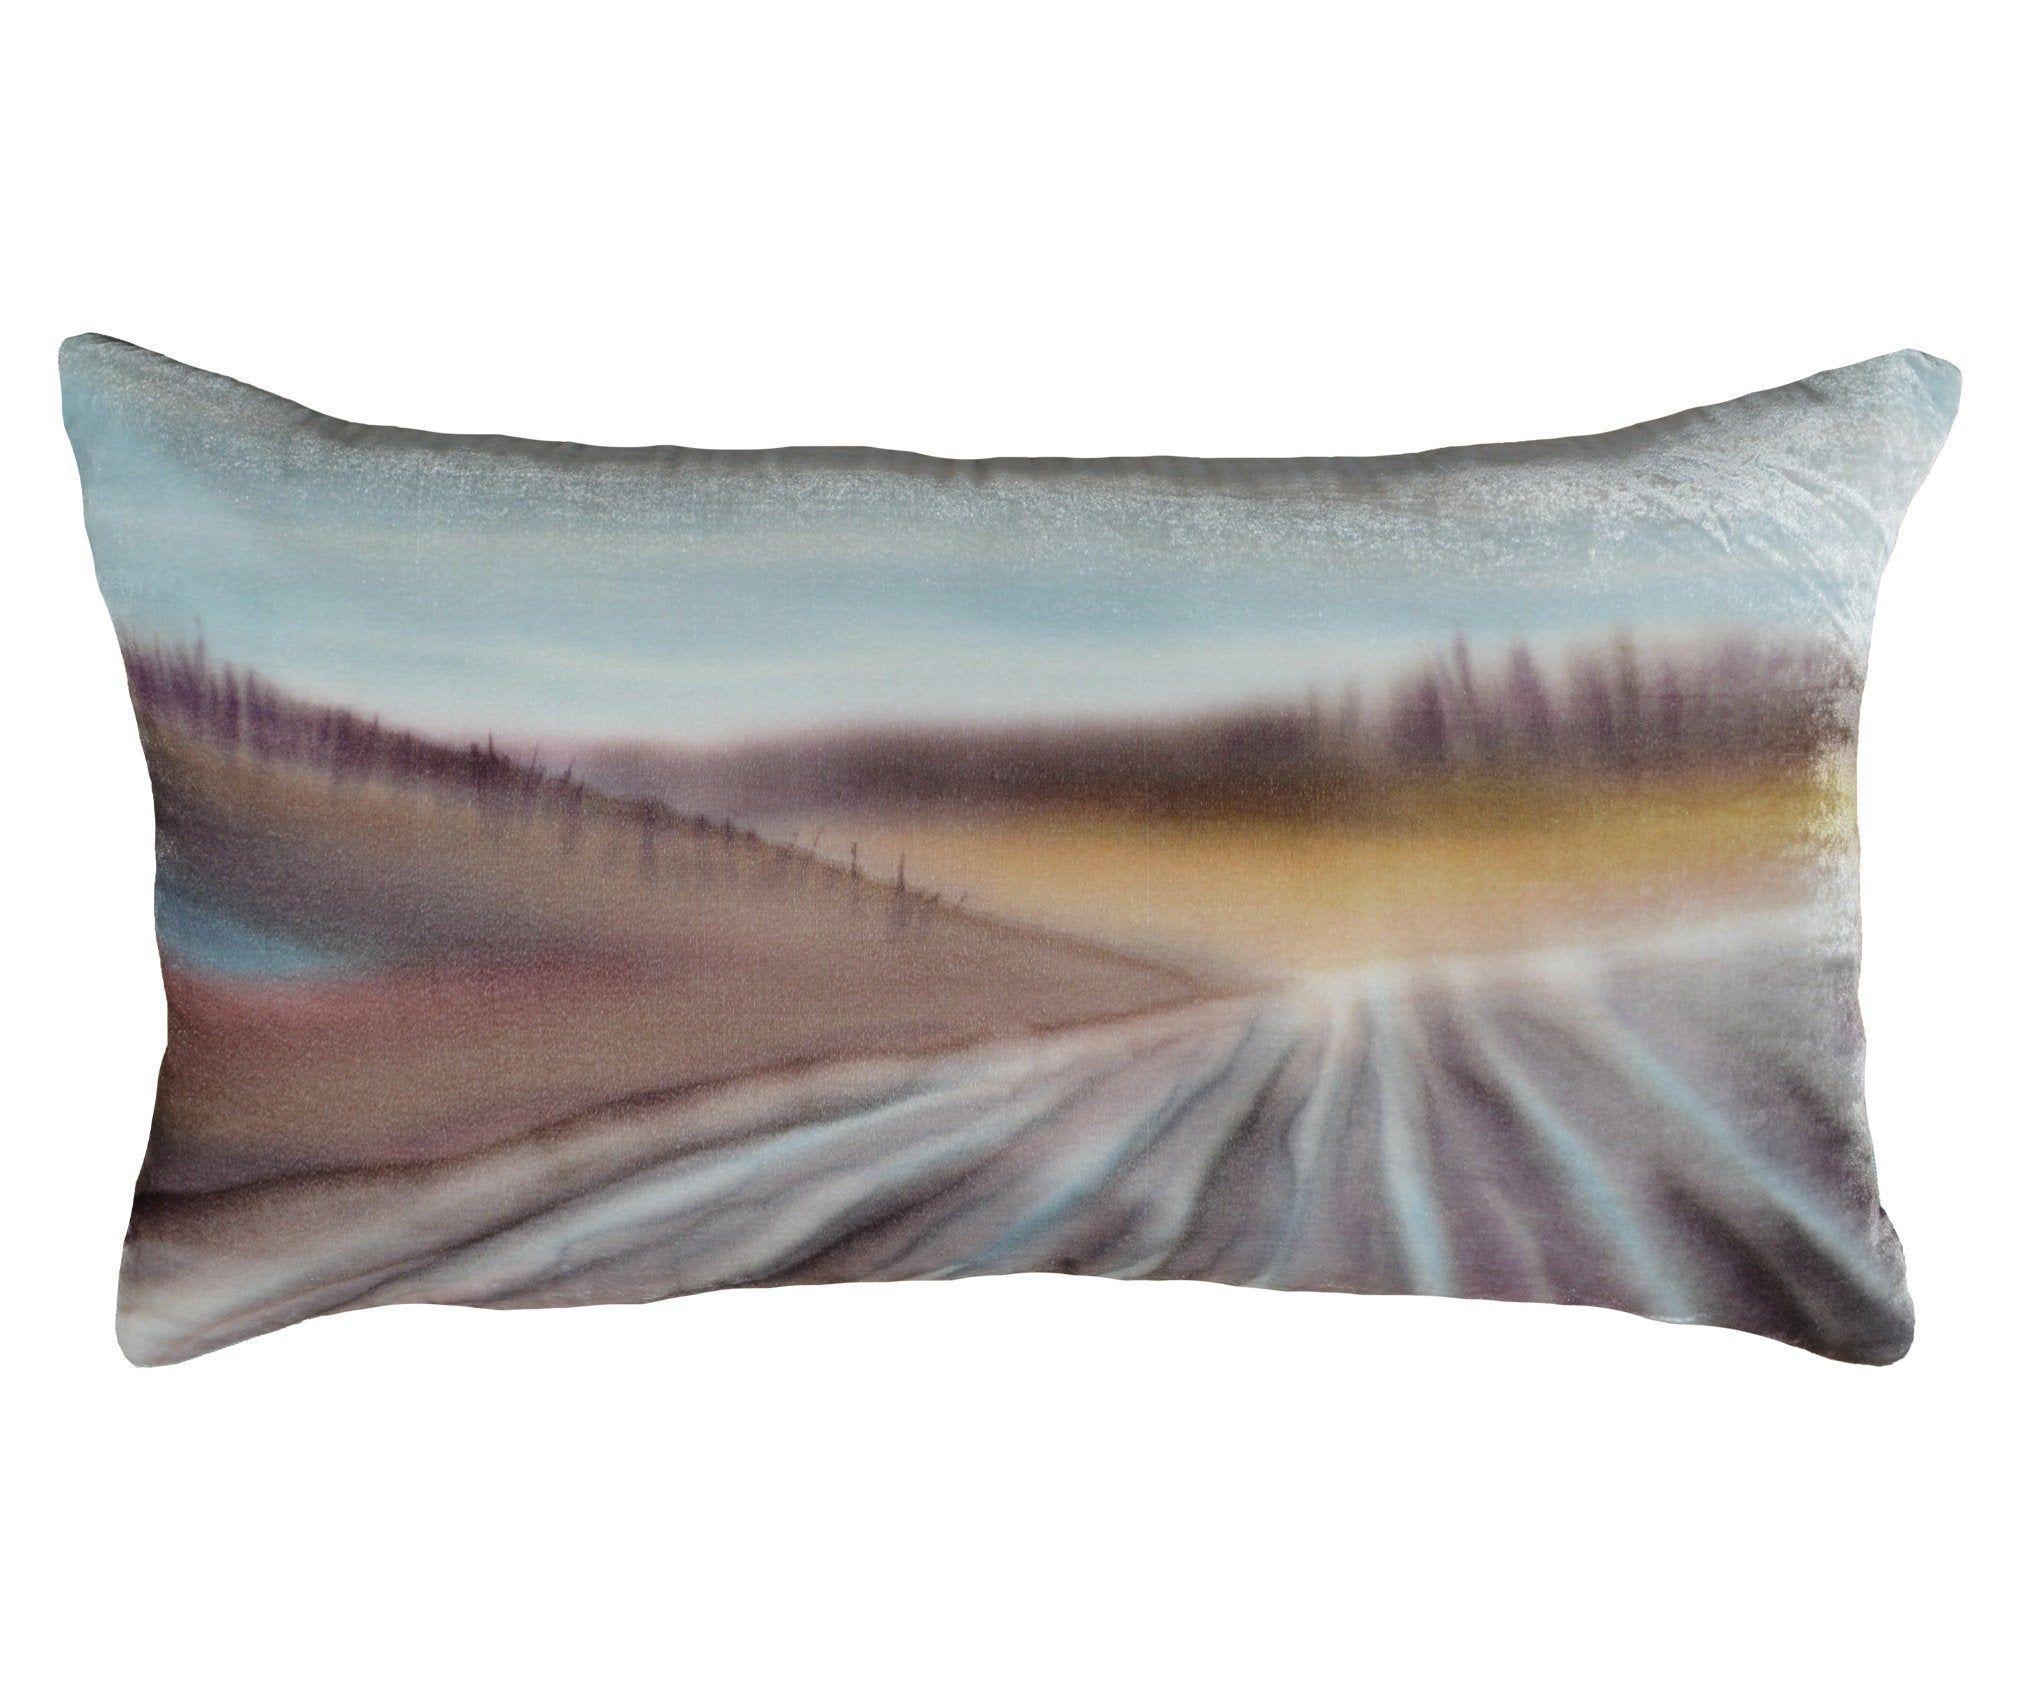 Velvet Linen 16x28 Decorative Pillow Cover Hand Painted Silk Velvet Landscape Art Lumbar Pillow For Sofa Luxury Handmade By Fabric17 Decorative Pillow Covers Decorative Pillows Silk Painting